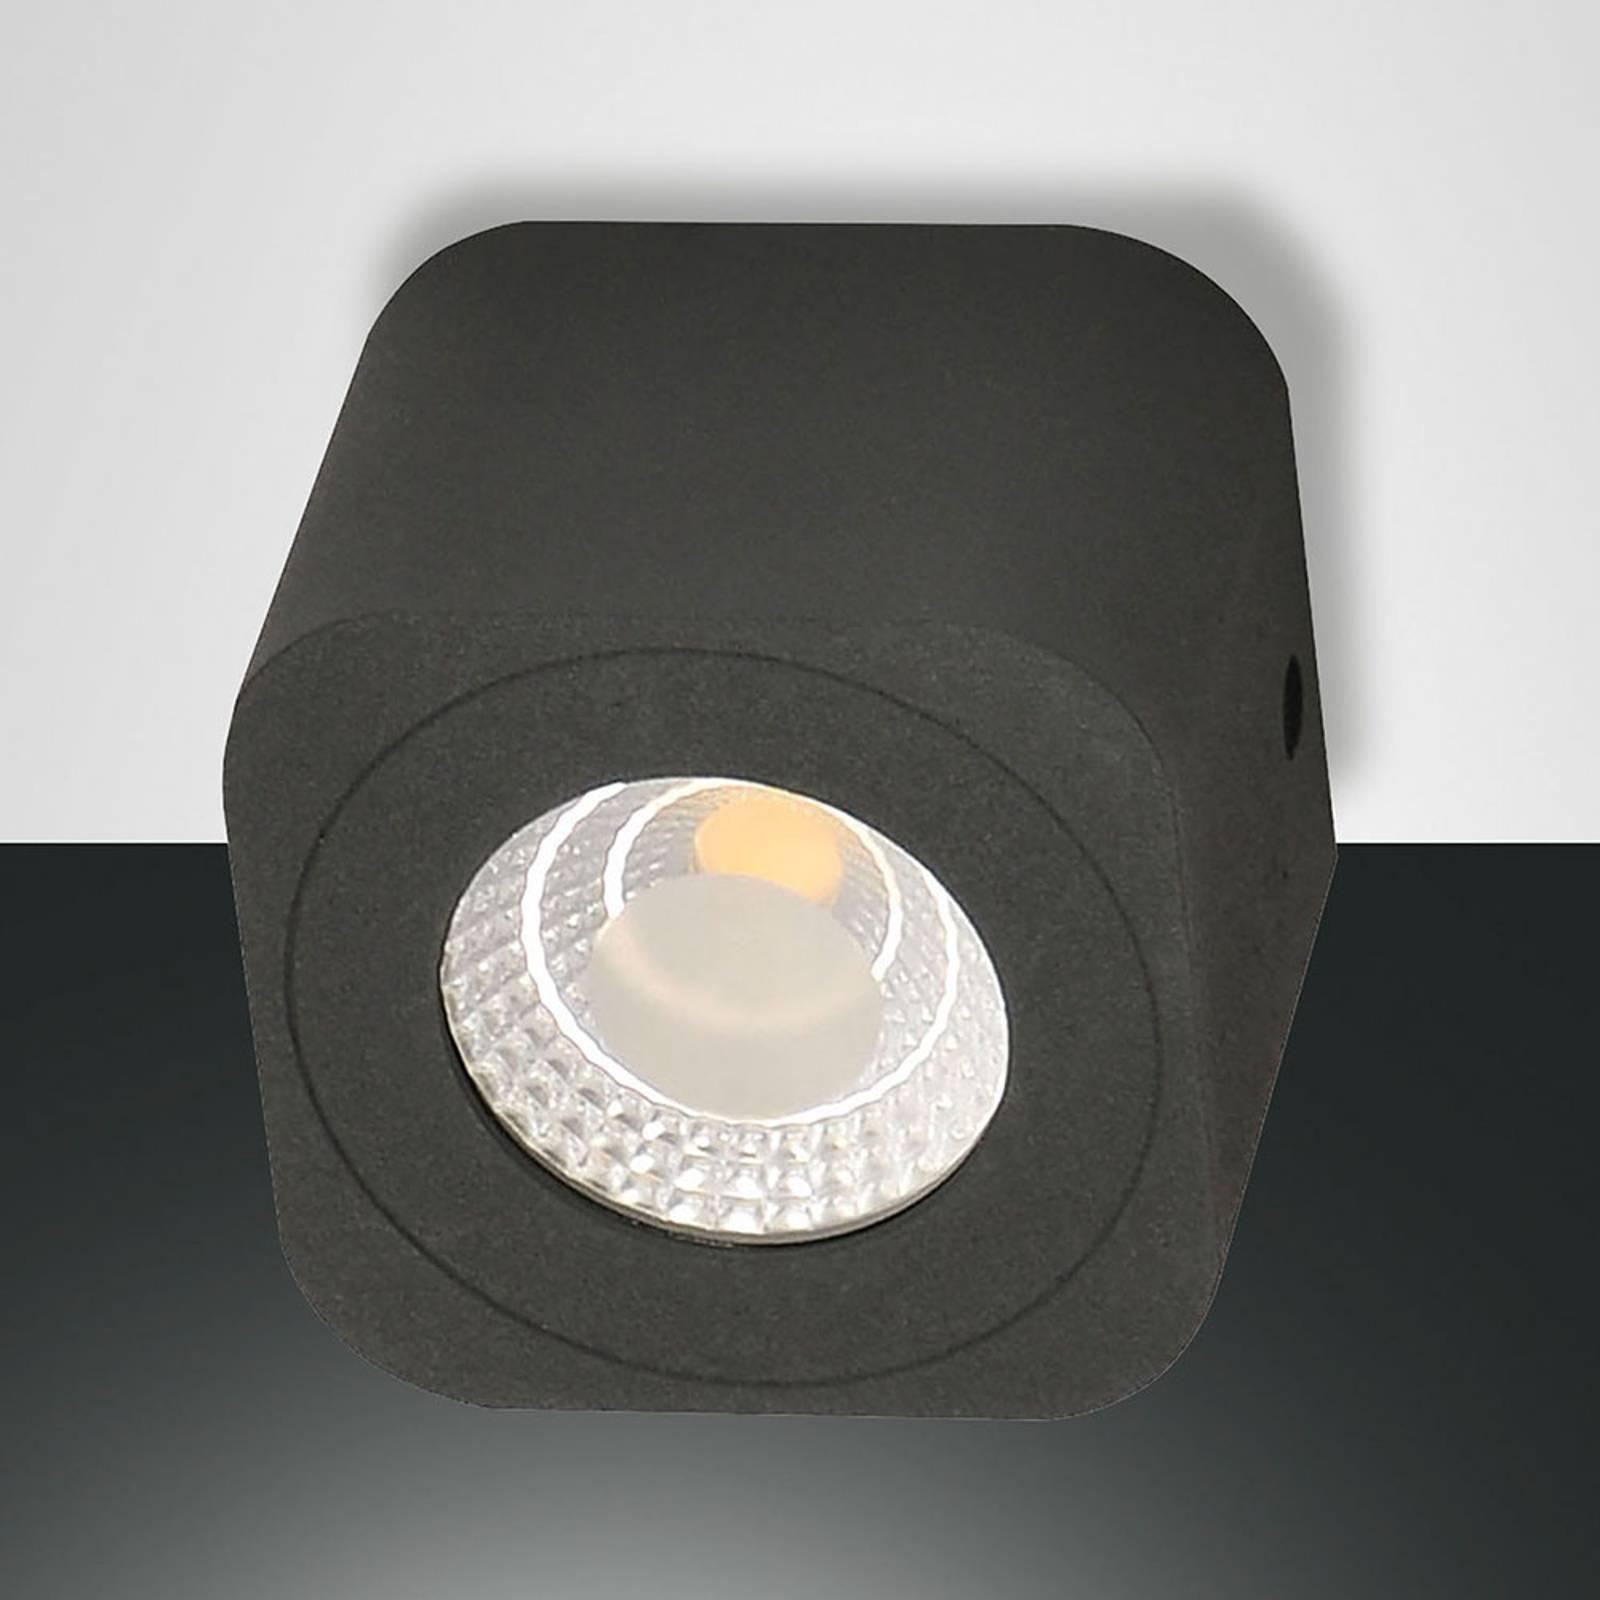 Vierkant LED downlight Palmi in antraciet